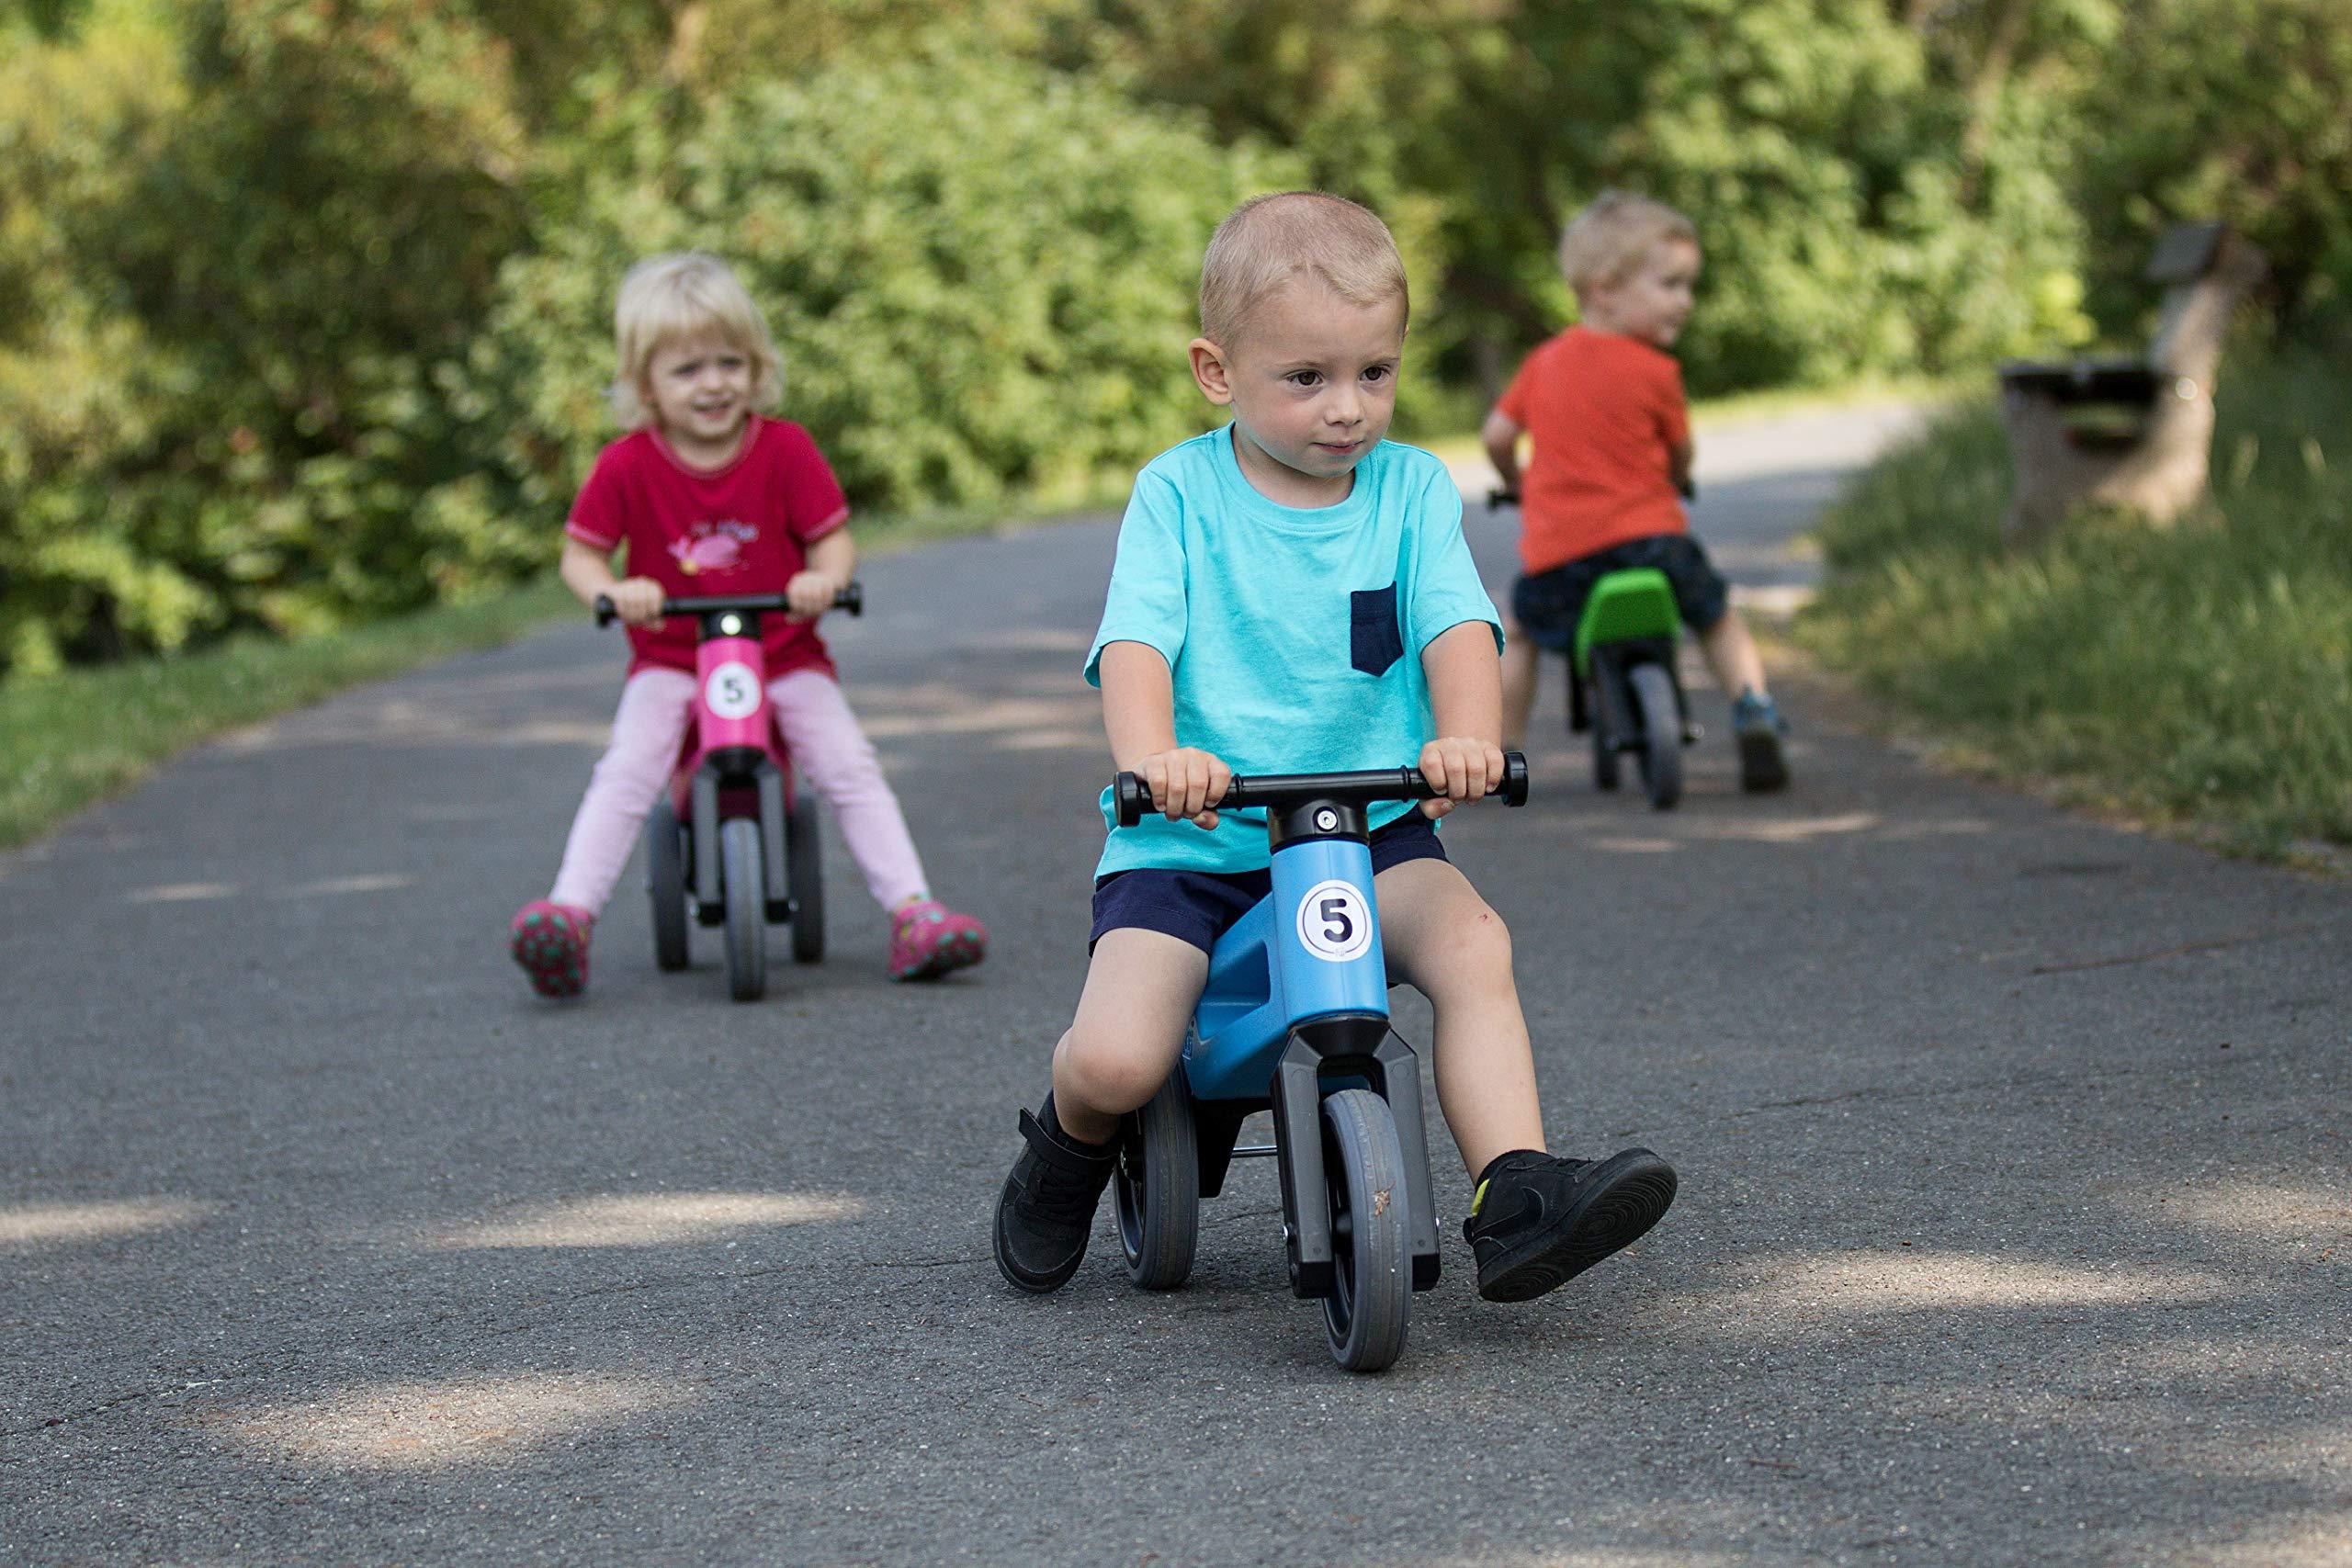 PlayMonster Free Wheelin' Rider Convertible Balance Bike, Pink by PlayMonster (Image #7)